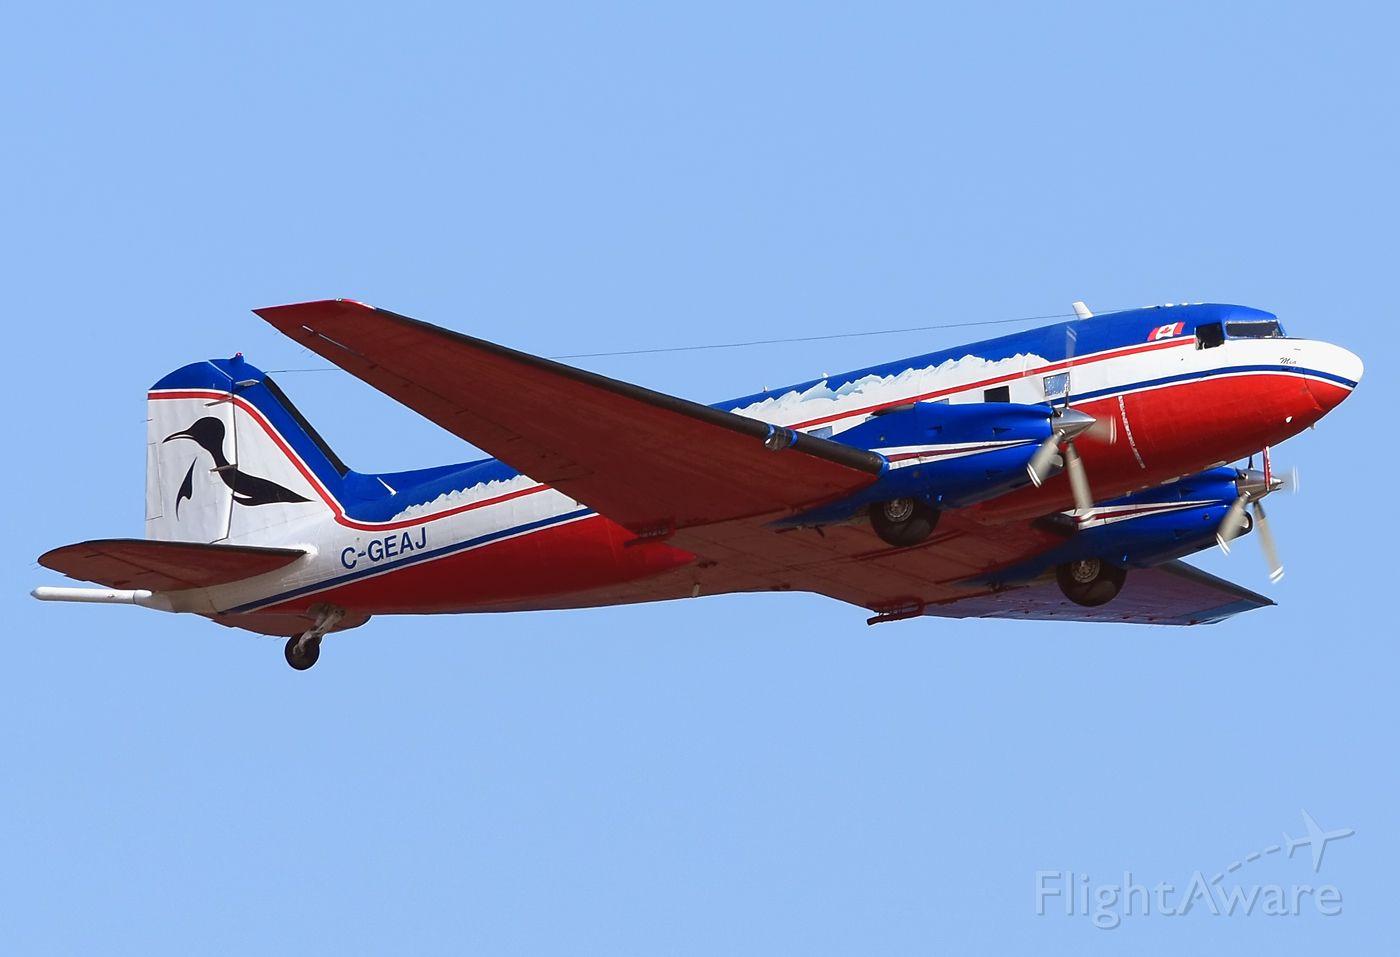 Douglas DC-3 (turbine) (C-GEAJ) - ALCI Aviation. December, 2018